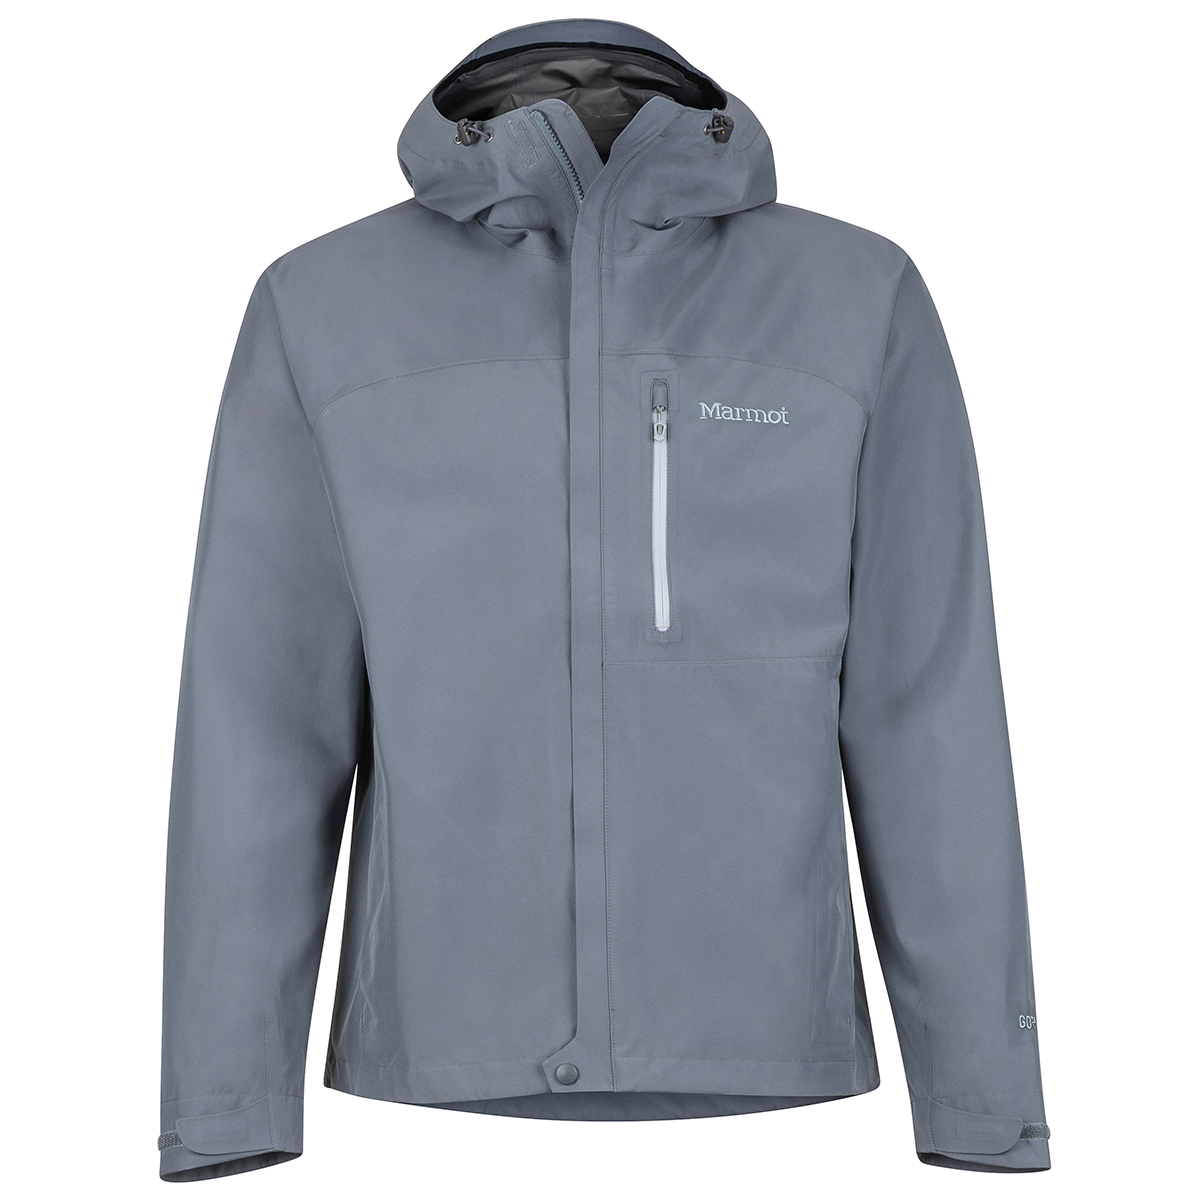 Marmot Men's Minimalist Waterproof Jacket - Black, M